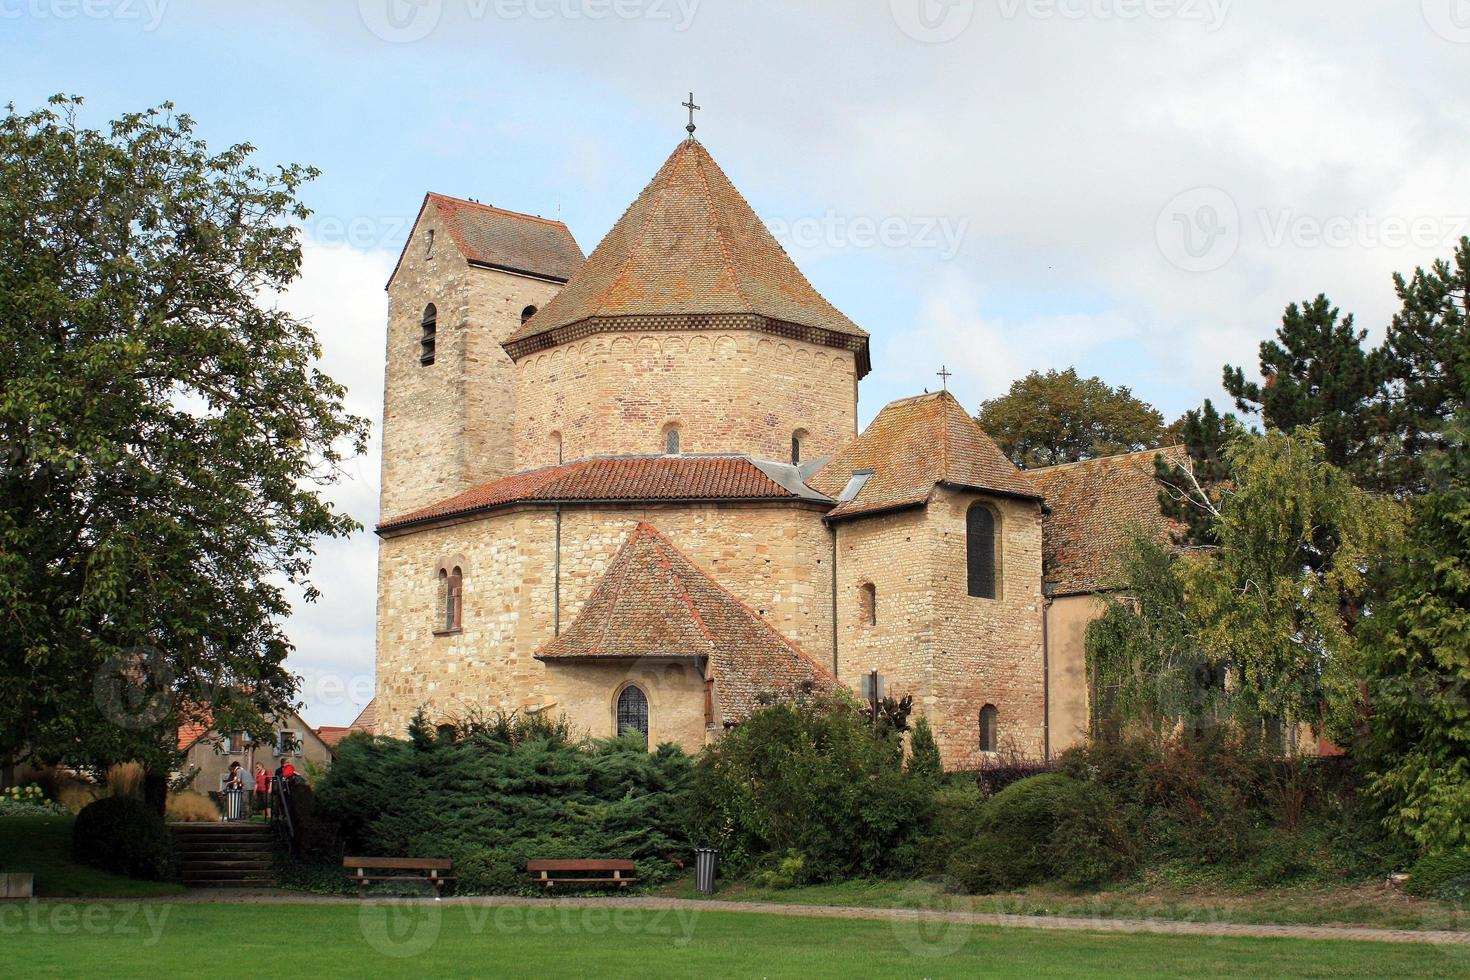 Octagonal church in Alsace photo